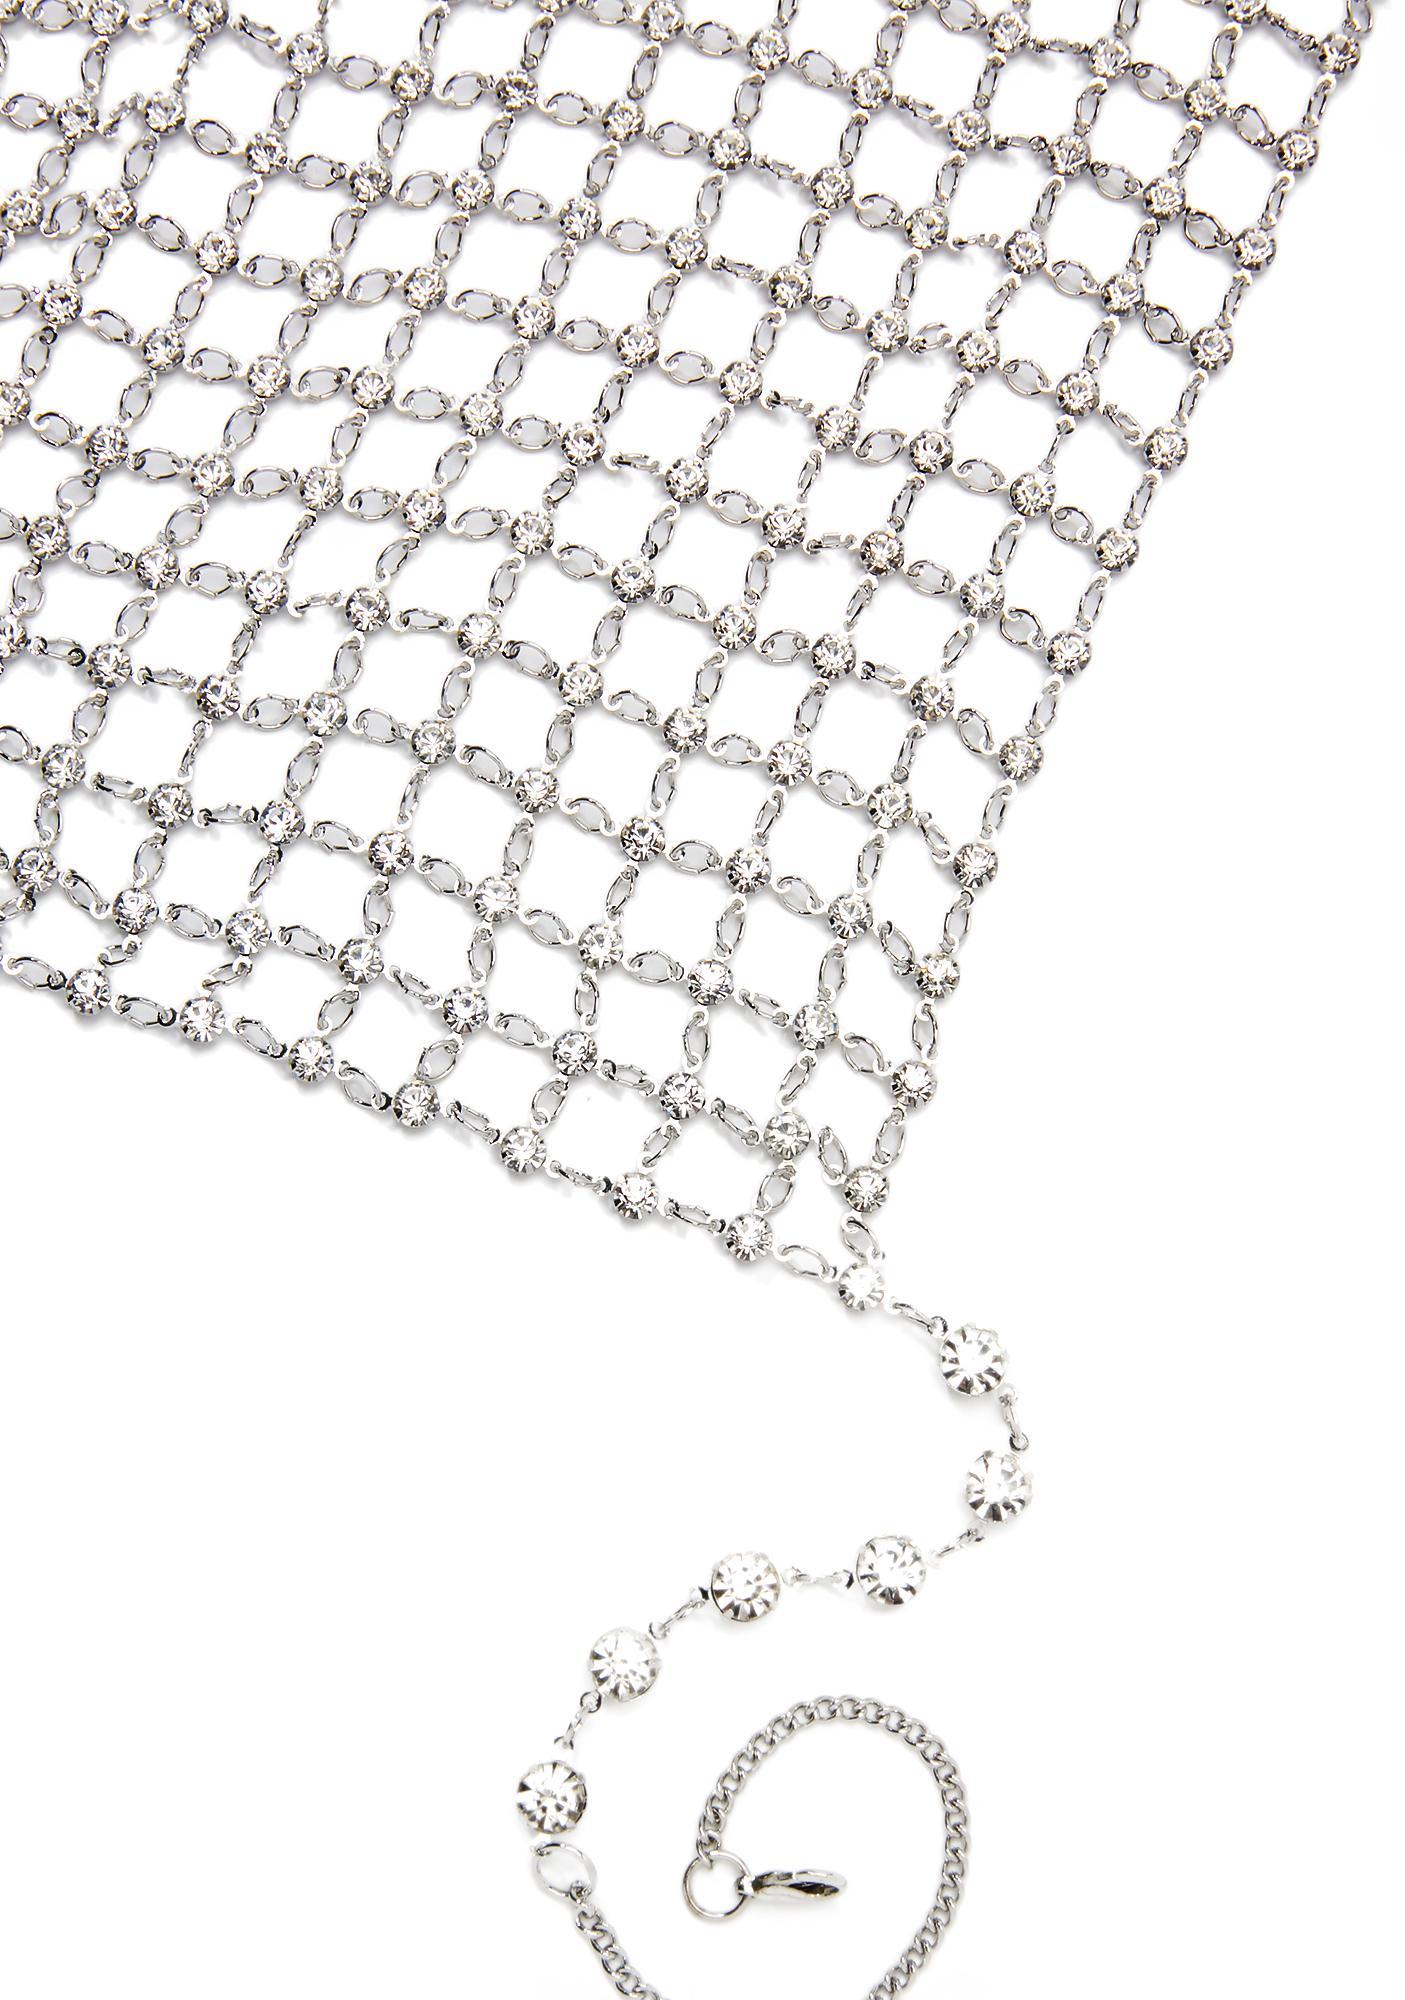 Shimmy Shimmy Rhinestone Chain Top